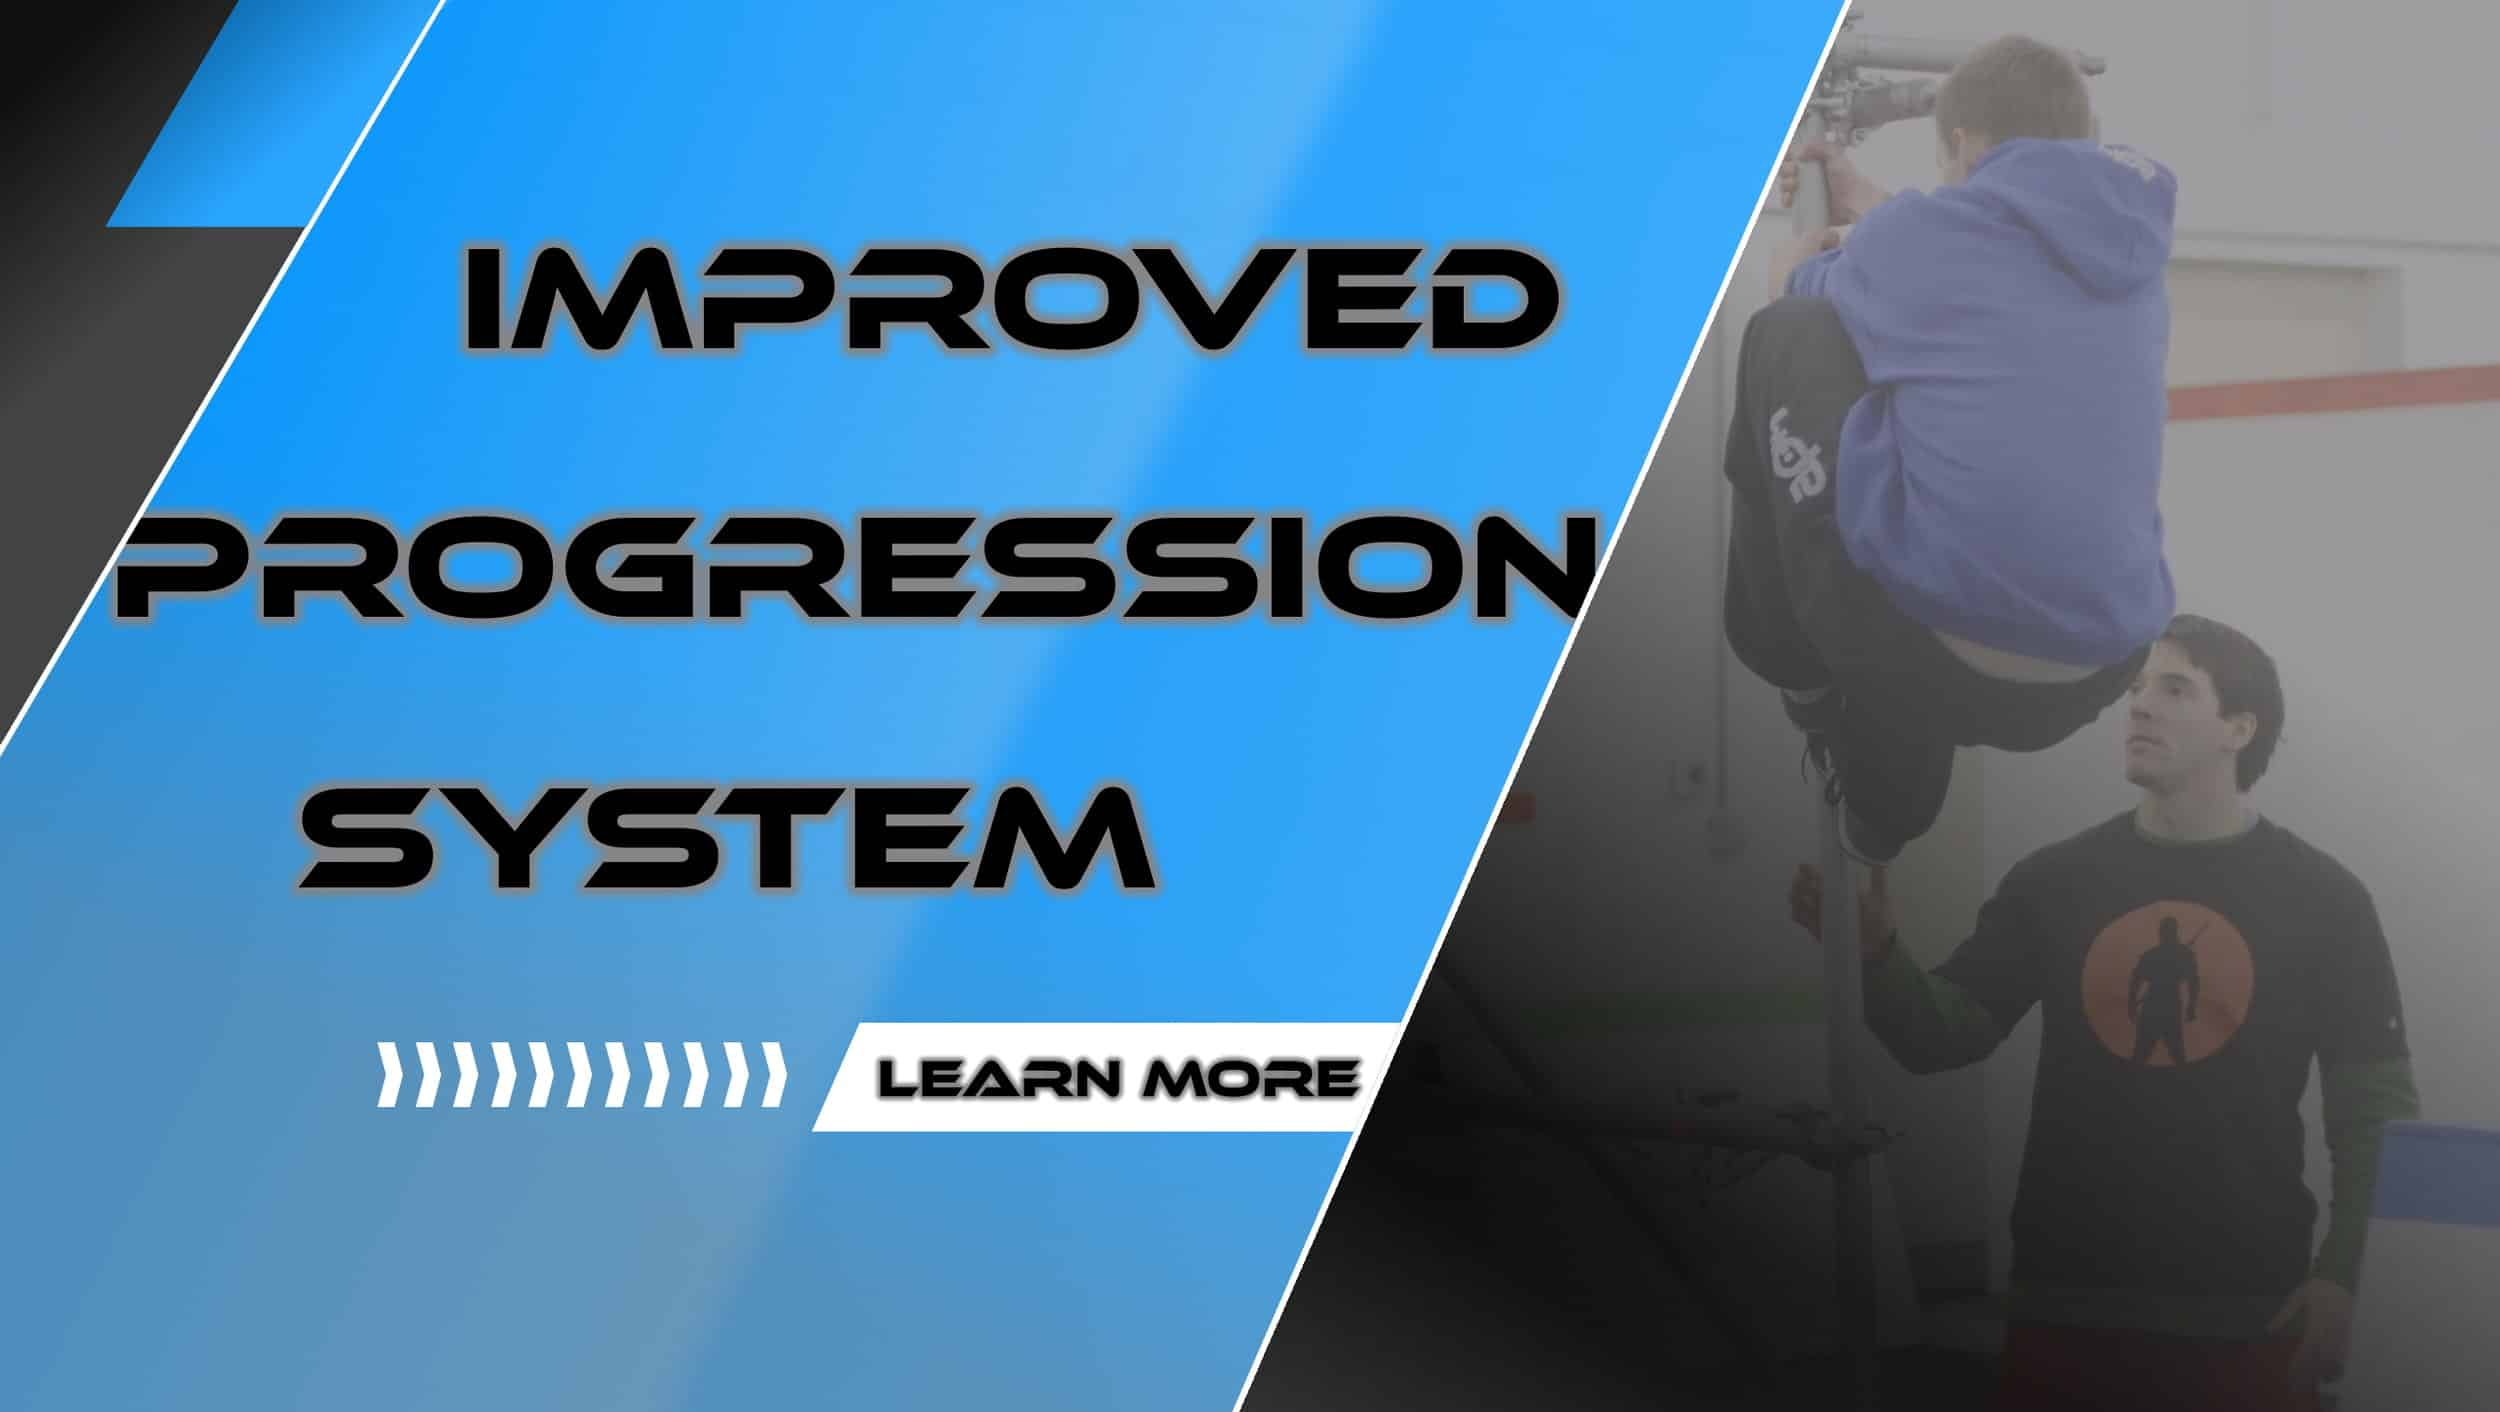 Improved Progression System